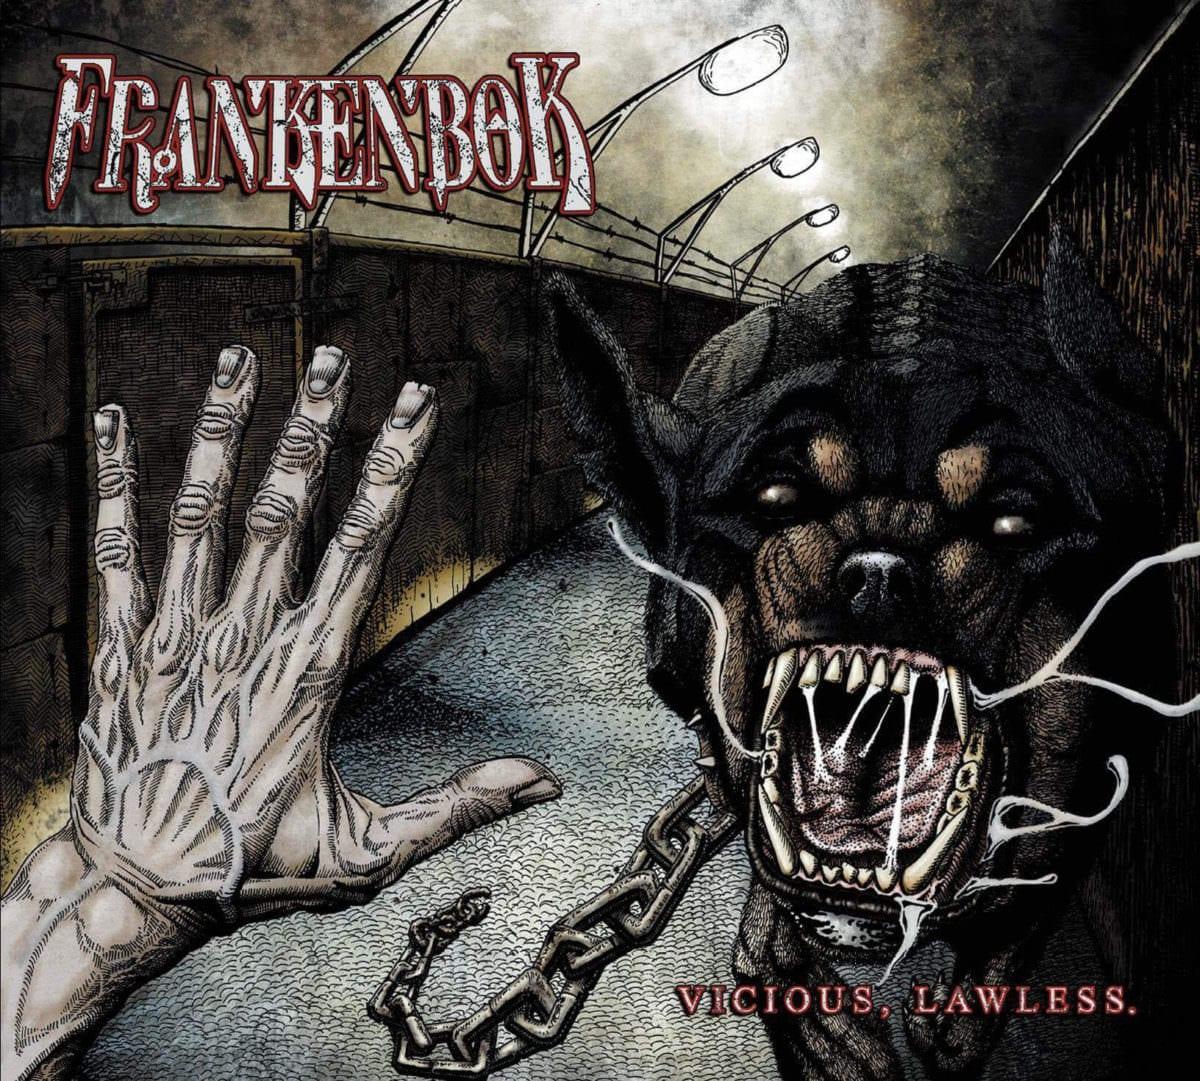 Frankenbok - Vicious Lawless album cover